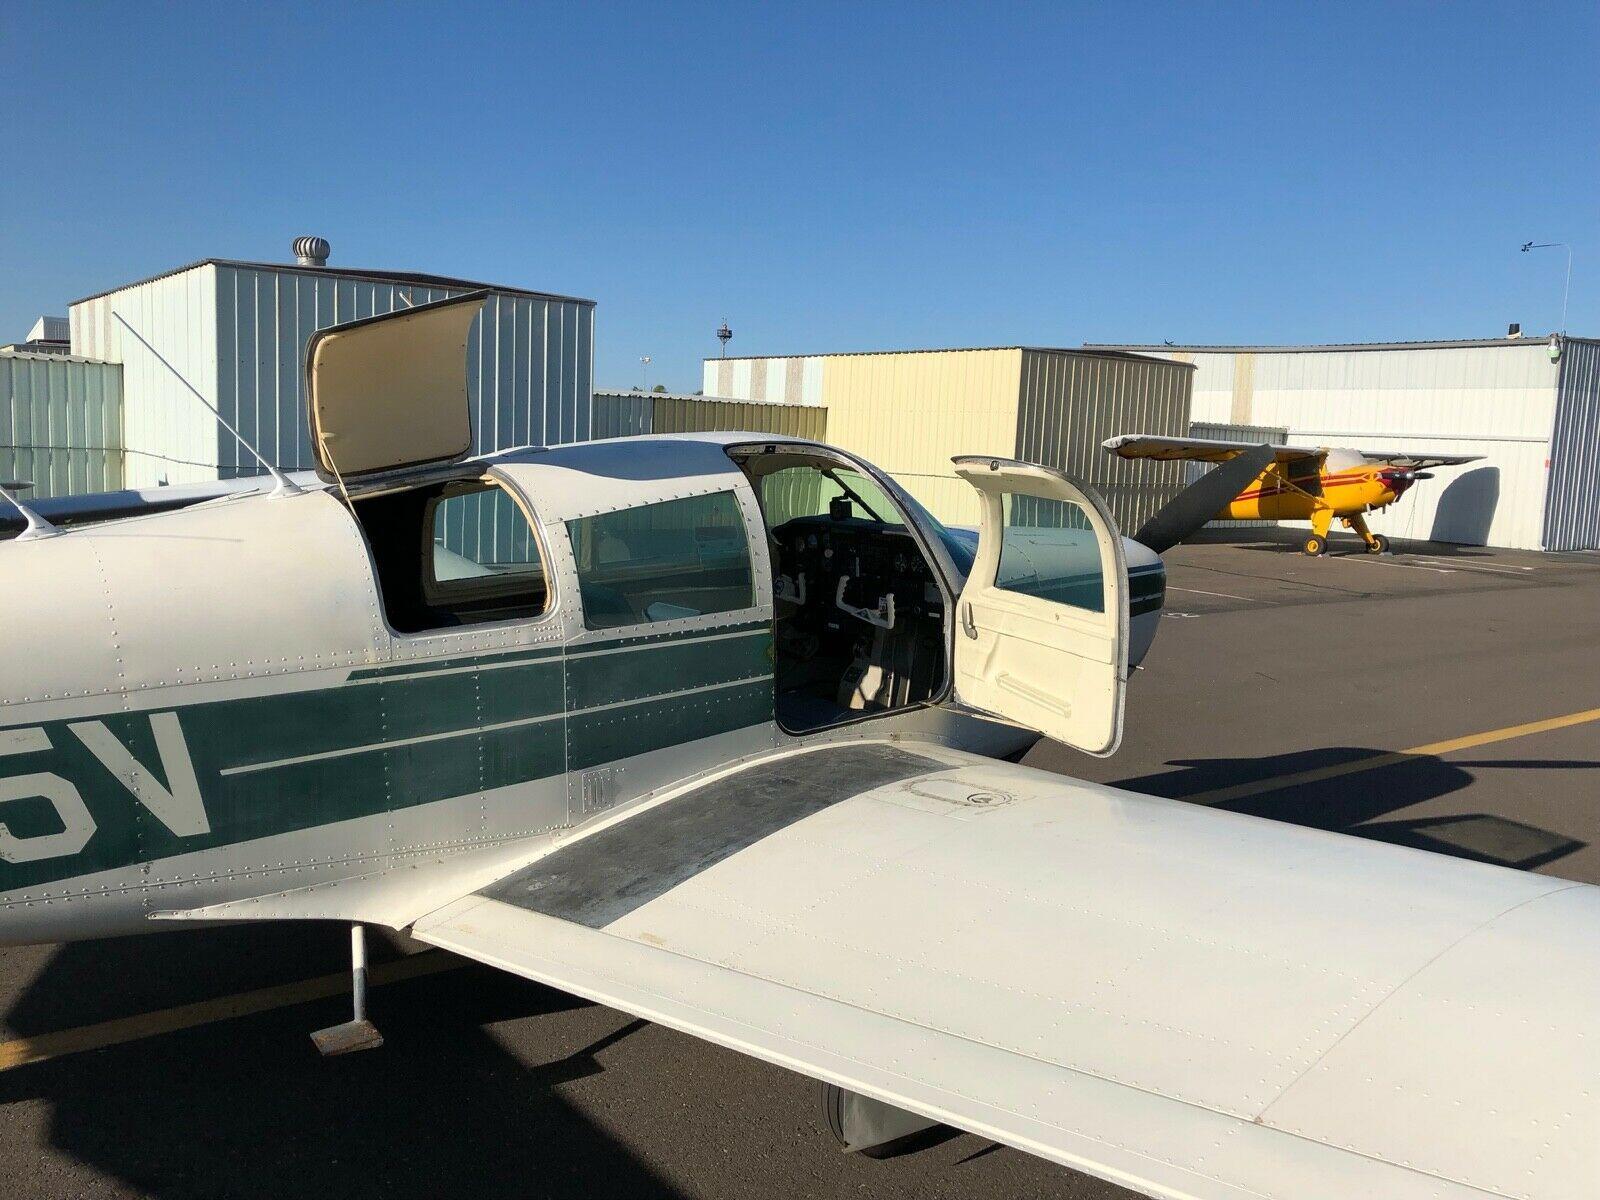 needs paint 1969 Mooney M20C aircraft